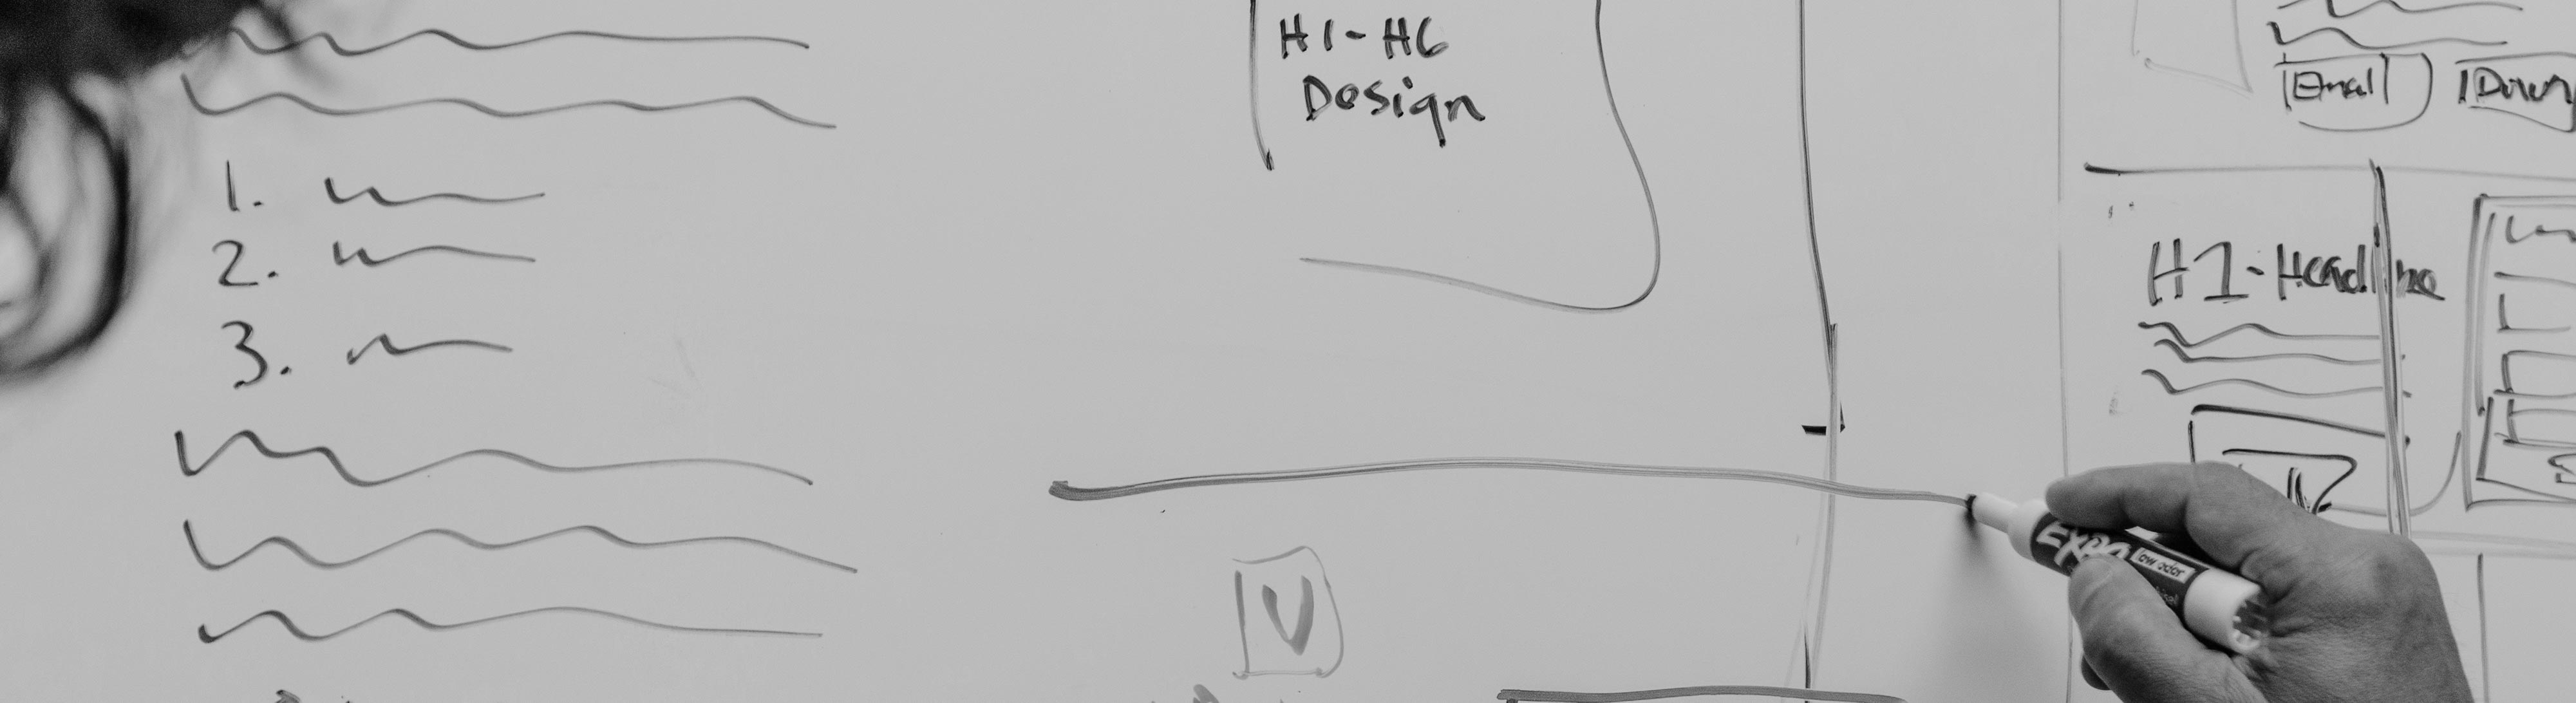 Concept afbeelding